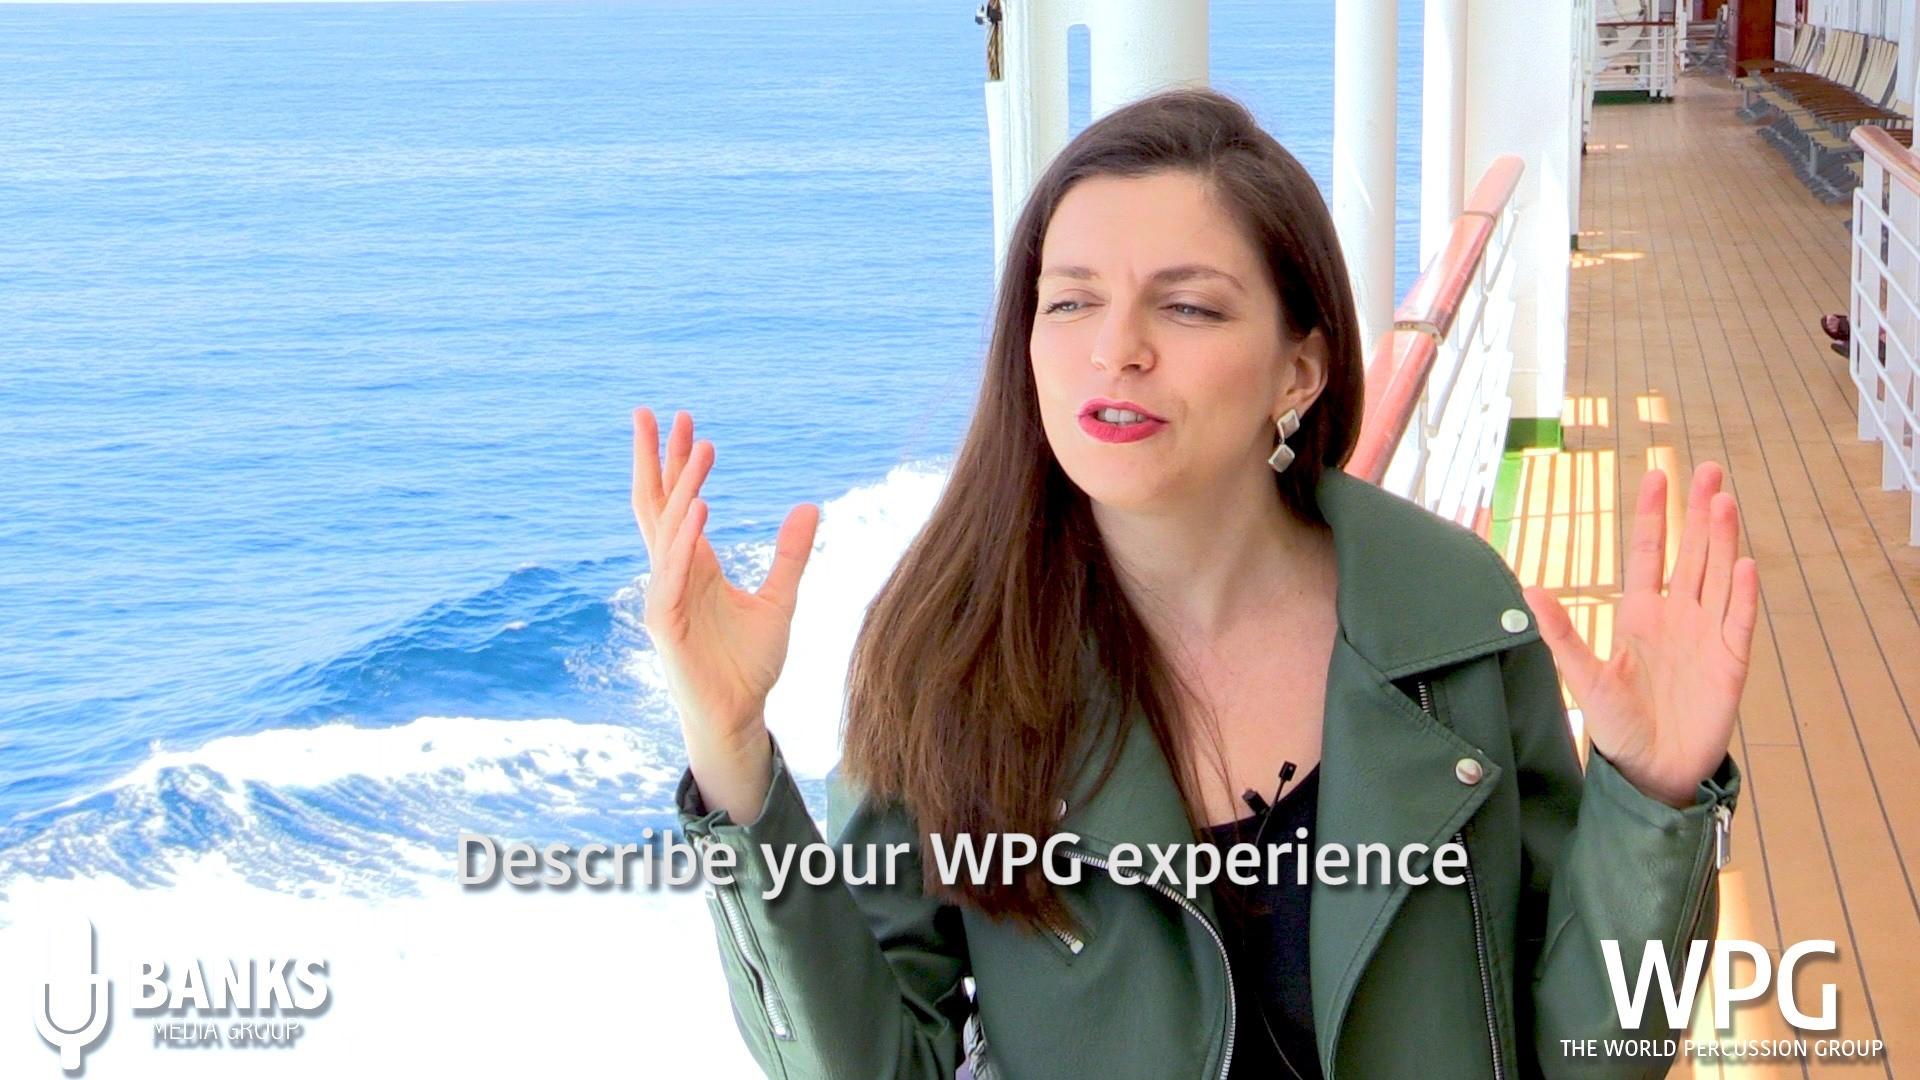 2019 WPG - Describe your experience!